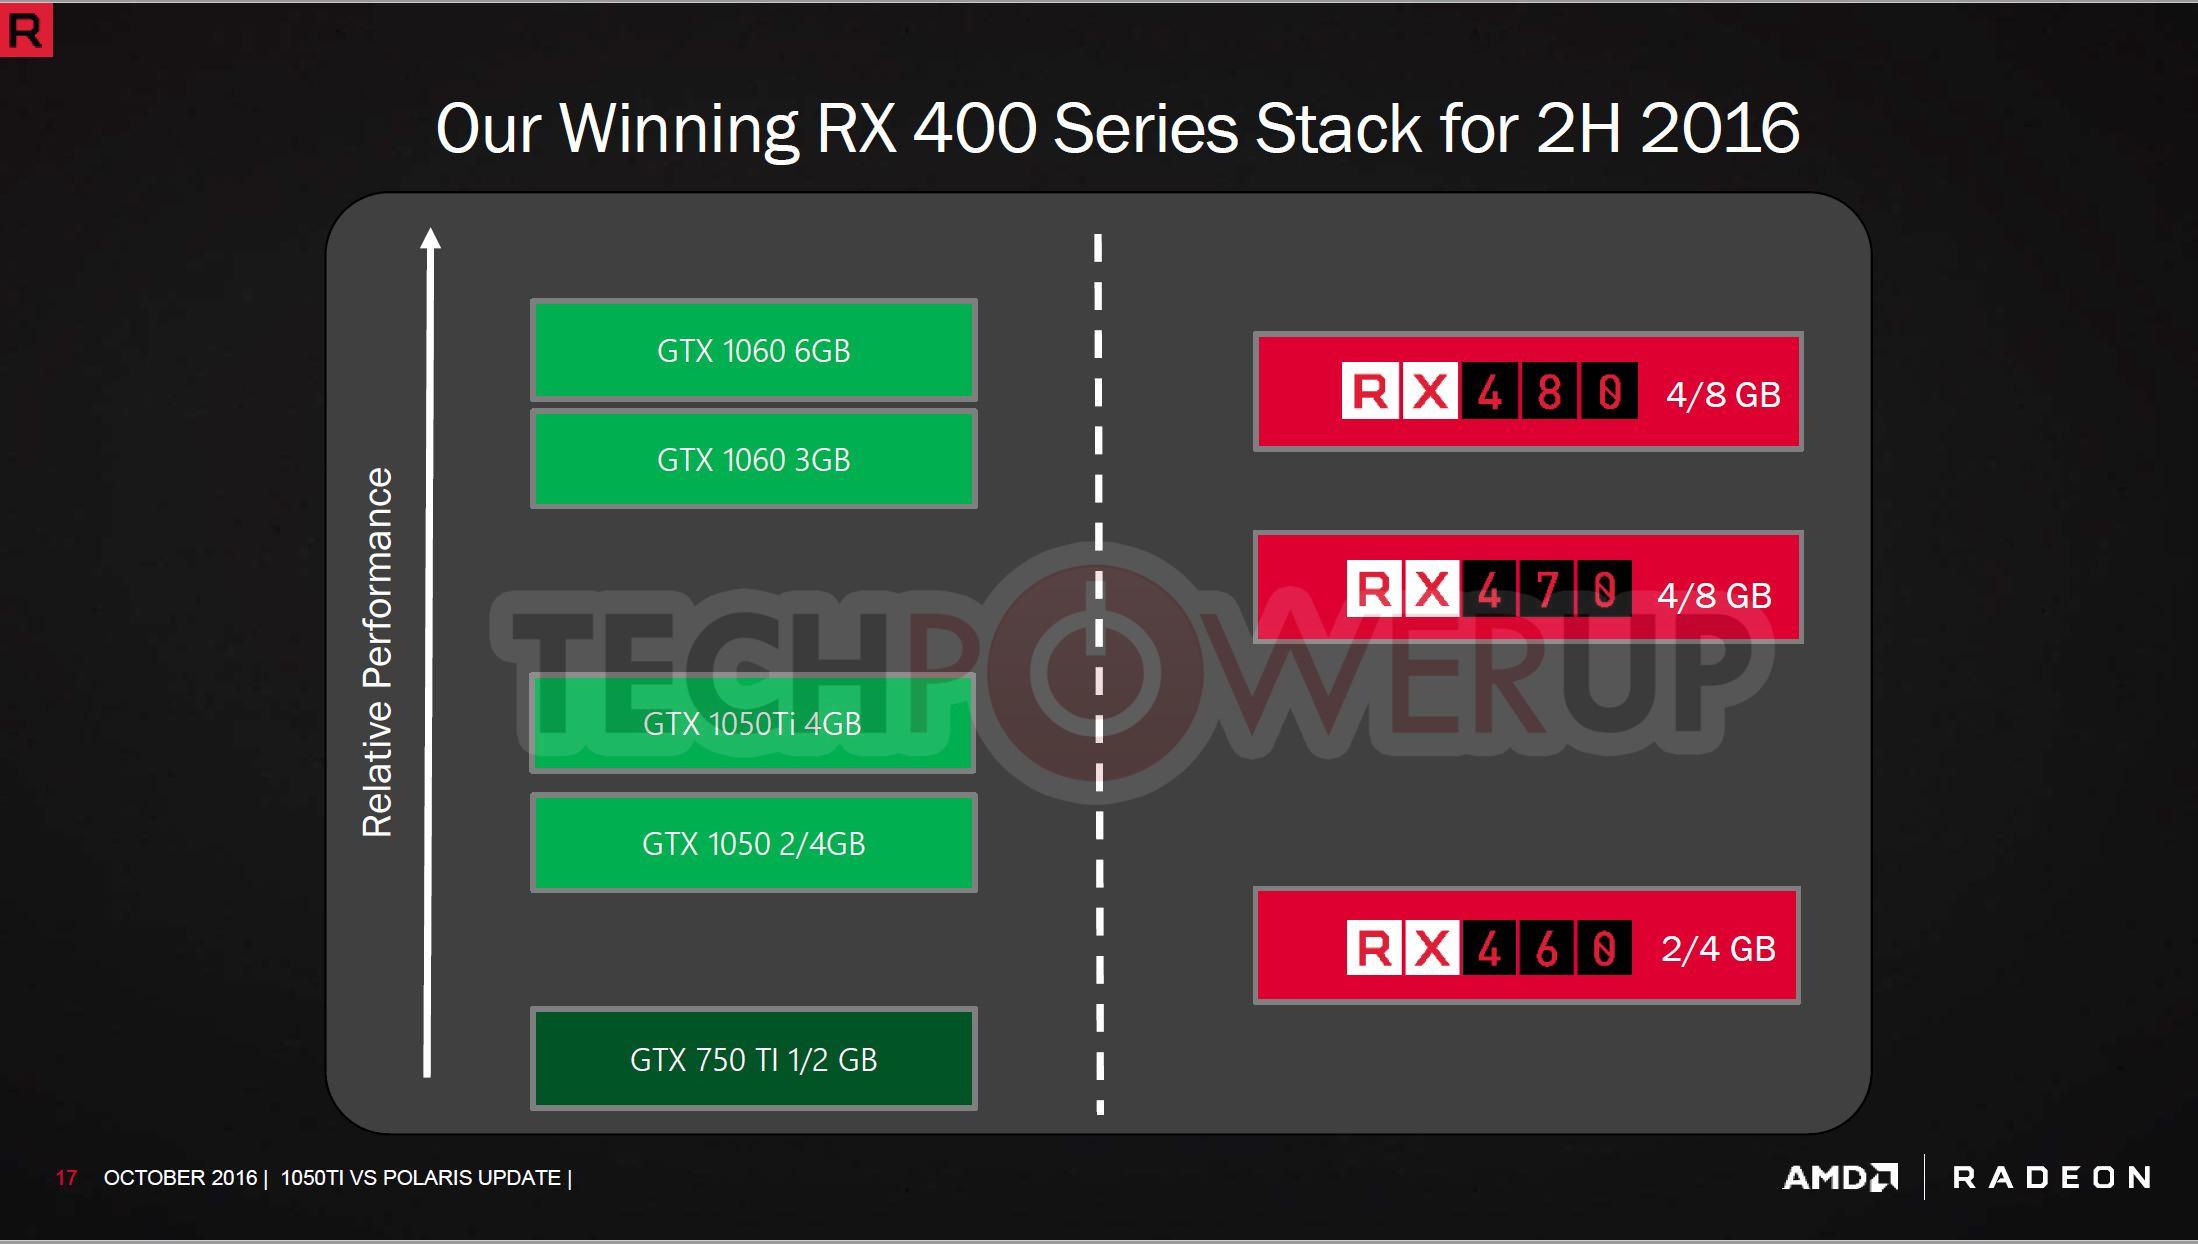 AMD: Radeon RX 470 is better choice than GeForce GTX 1050 Ti